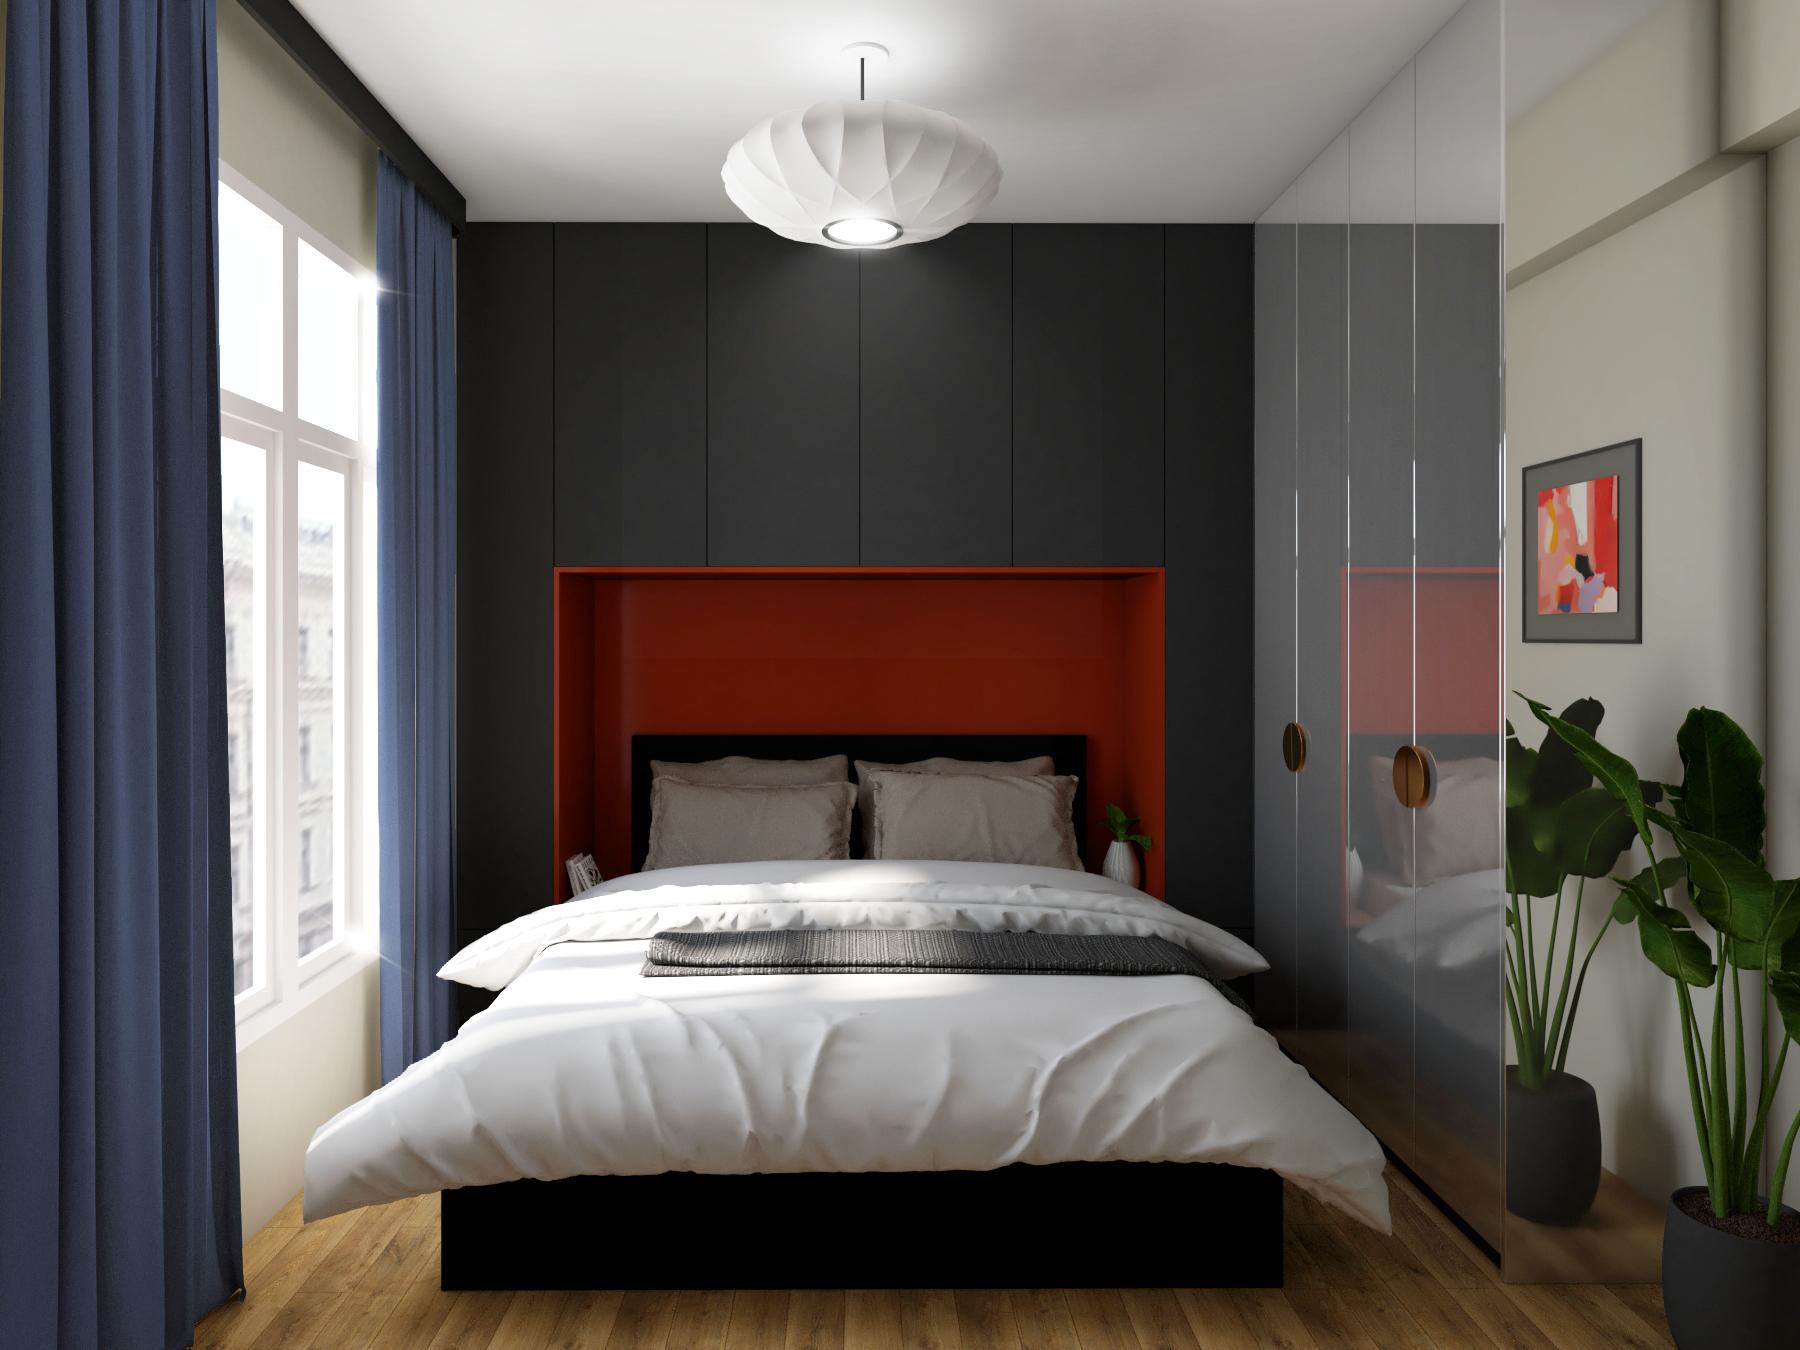 bedroom_red